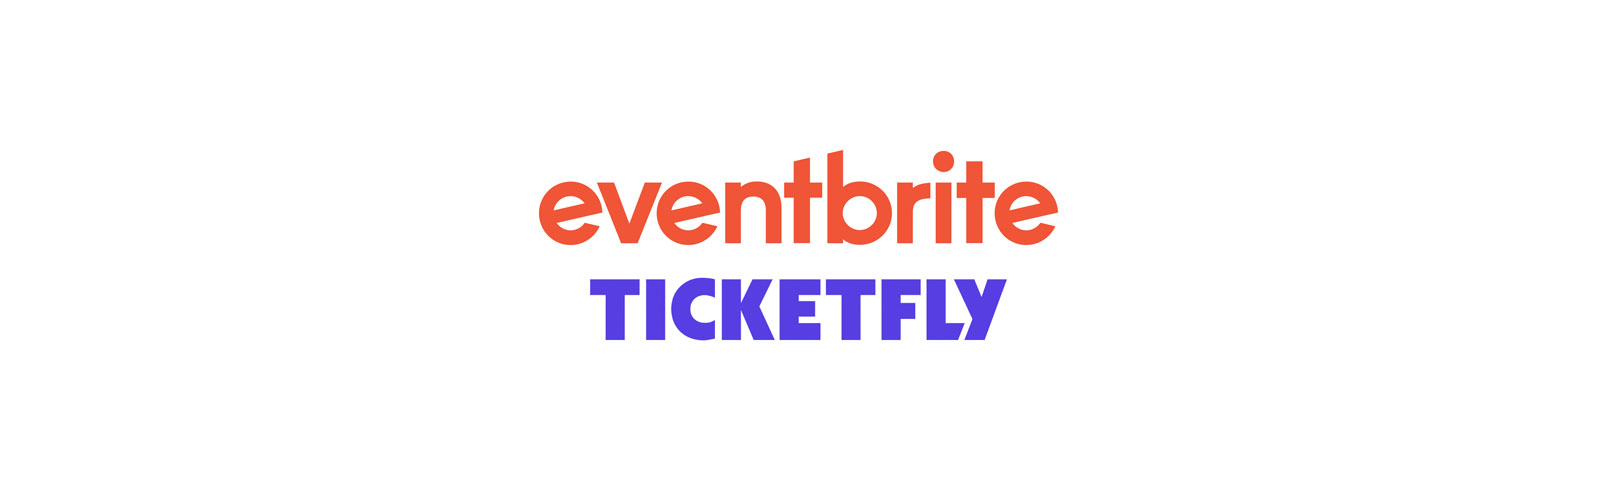 eventbrite-ticketfly